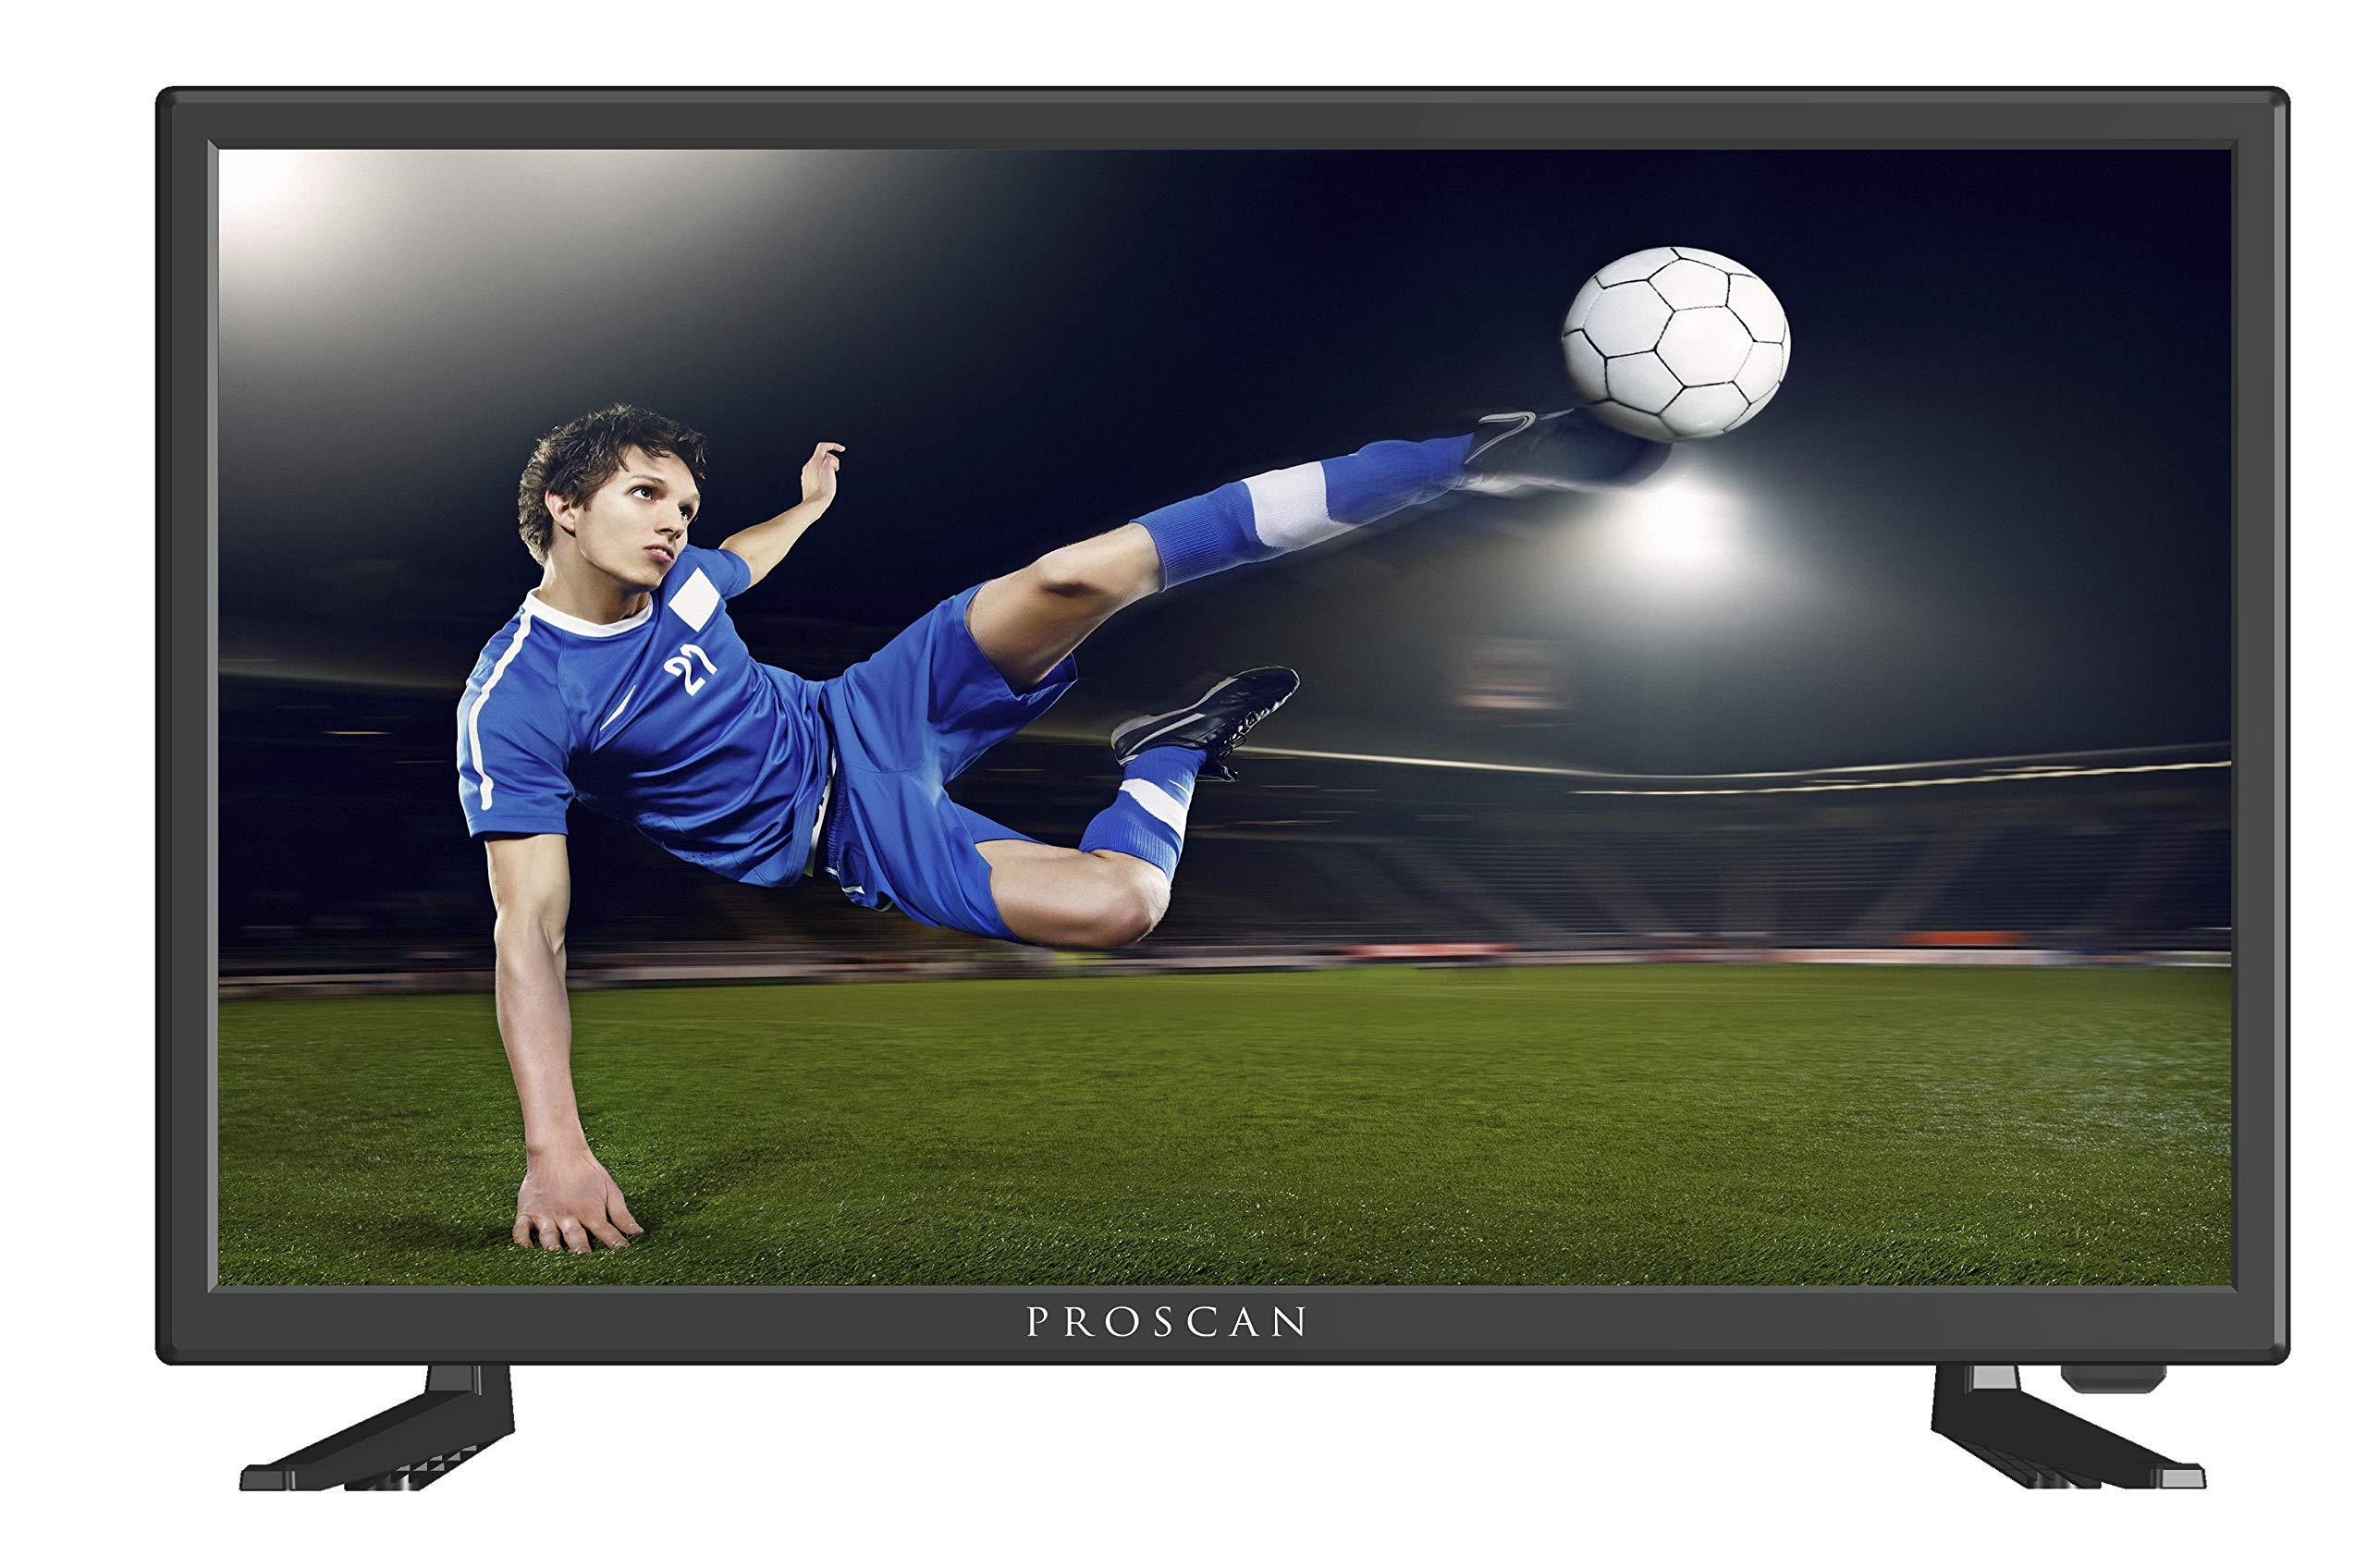 Proscan PLEDV2488A 24 Inch TV DVD Combo